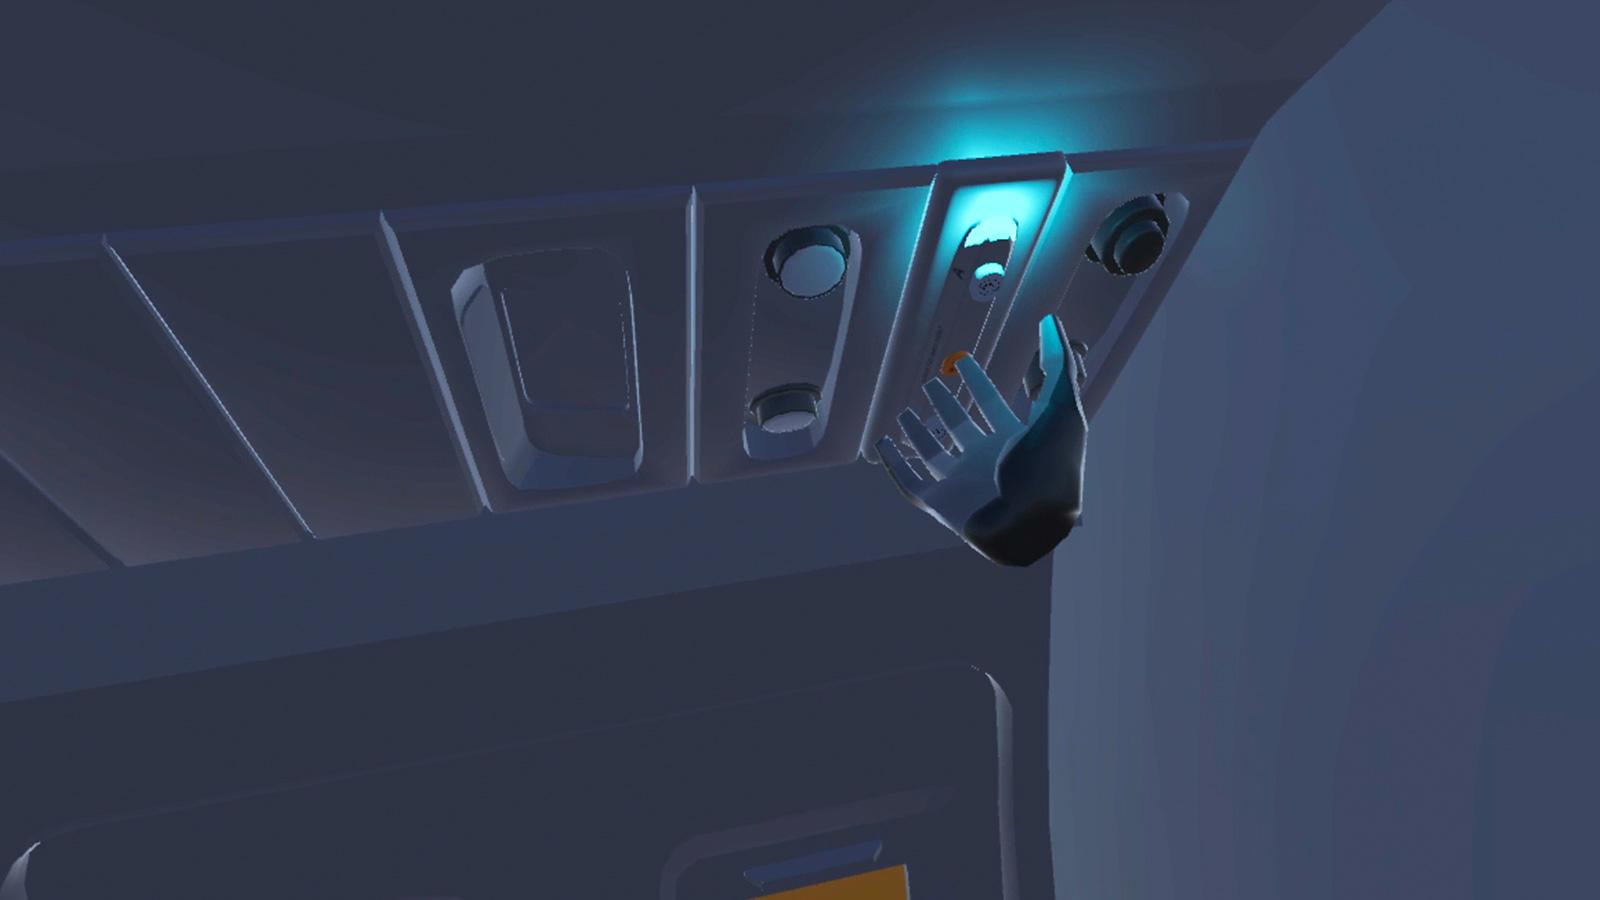 Virtual Reality flight simulator training with hand pressing button